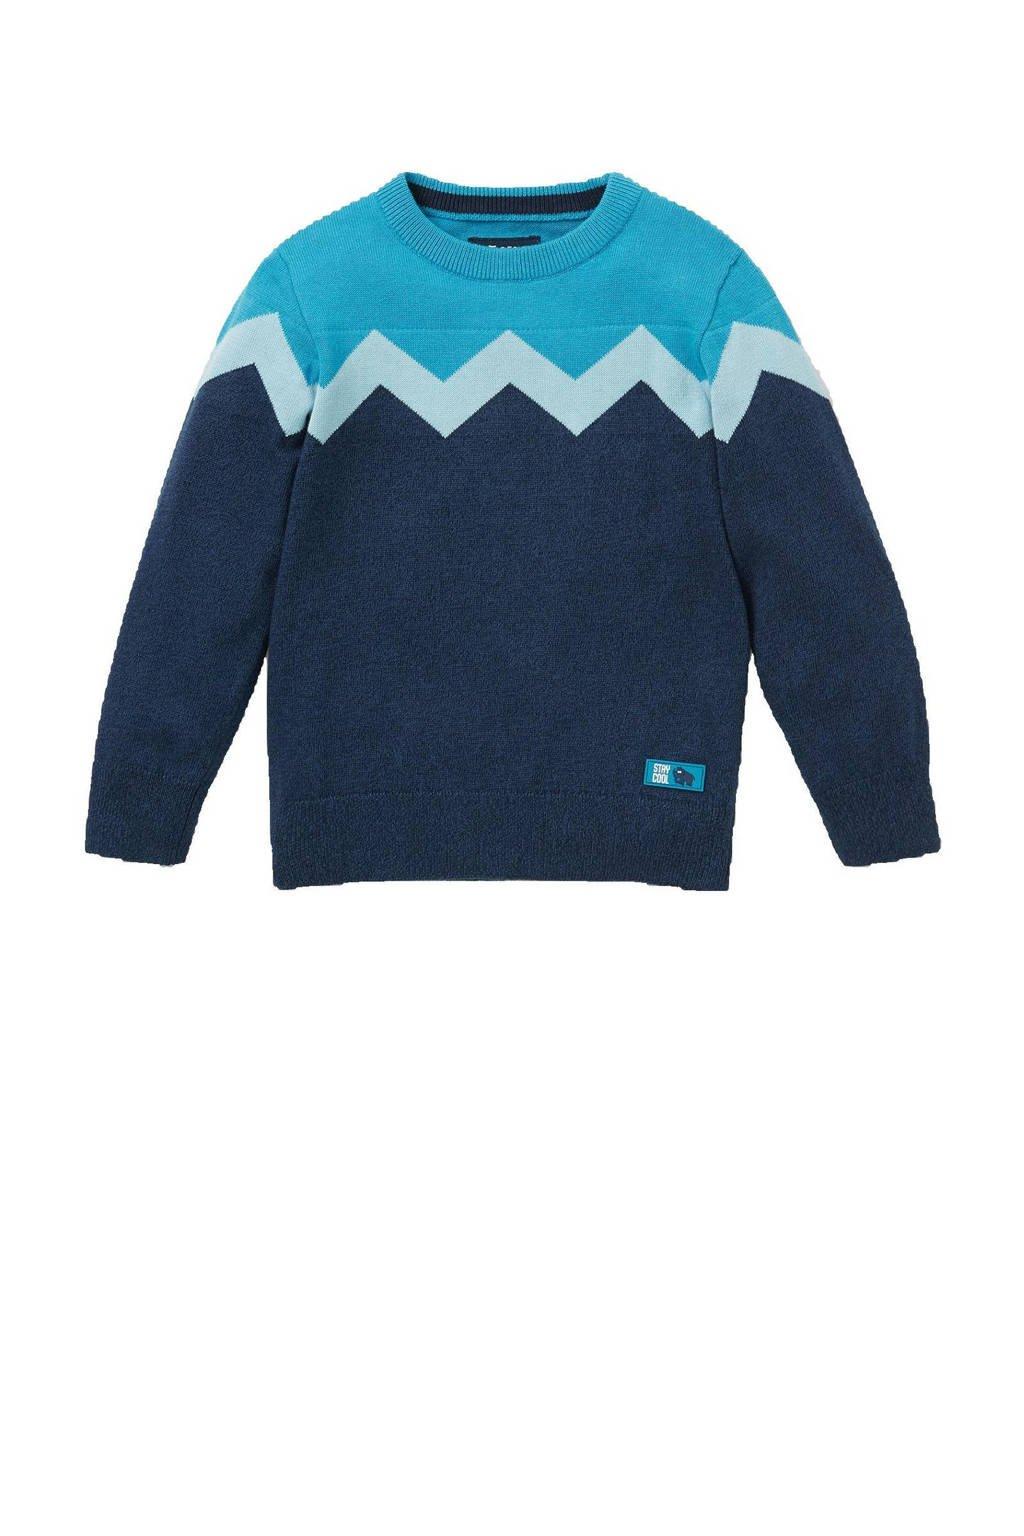 C&A Here & There trui donkerblauw/blauw/wit, Donkerblauw/blauw/wit